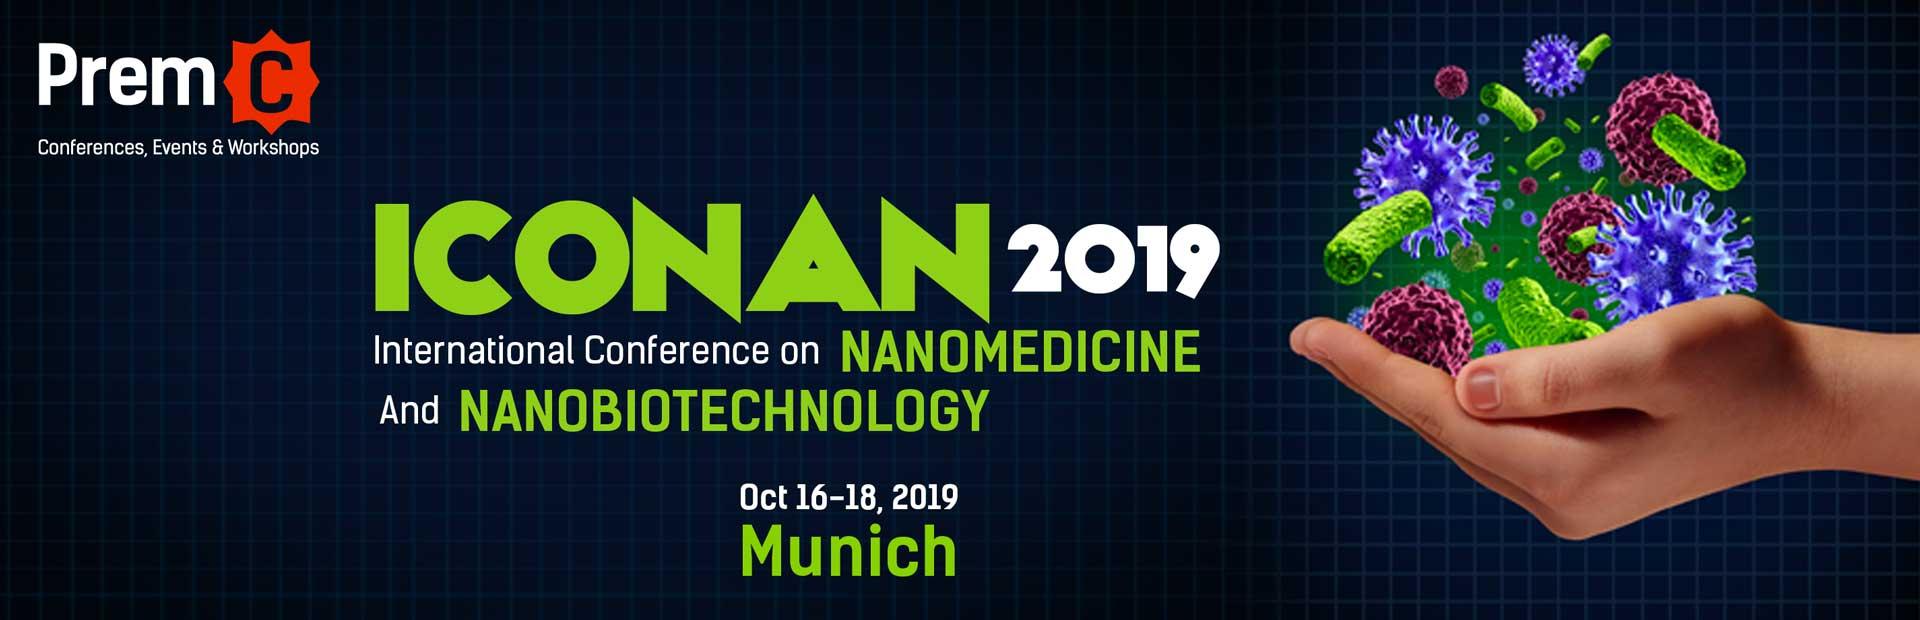 International Conference On Nanomedicine And Nanobiotechnology 2018